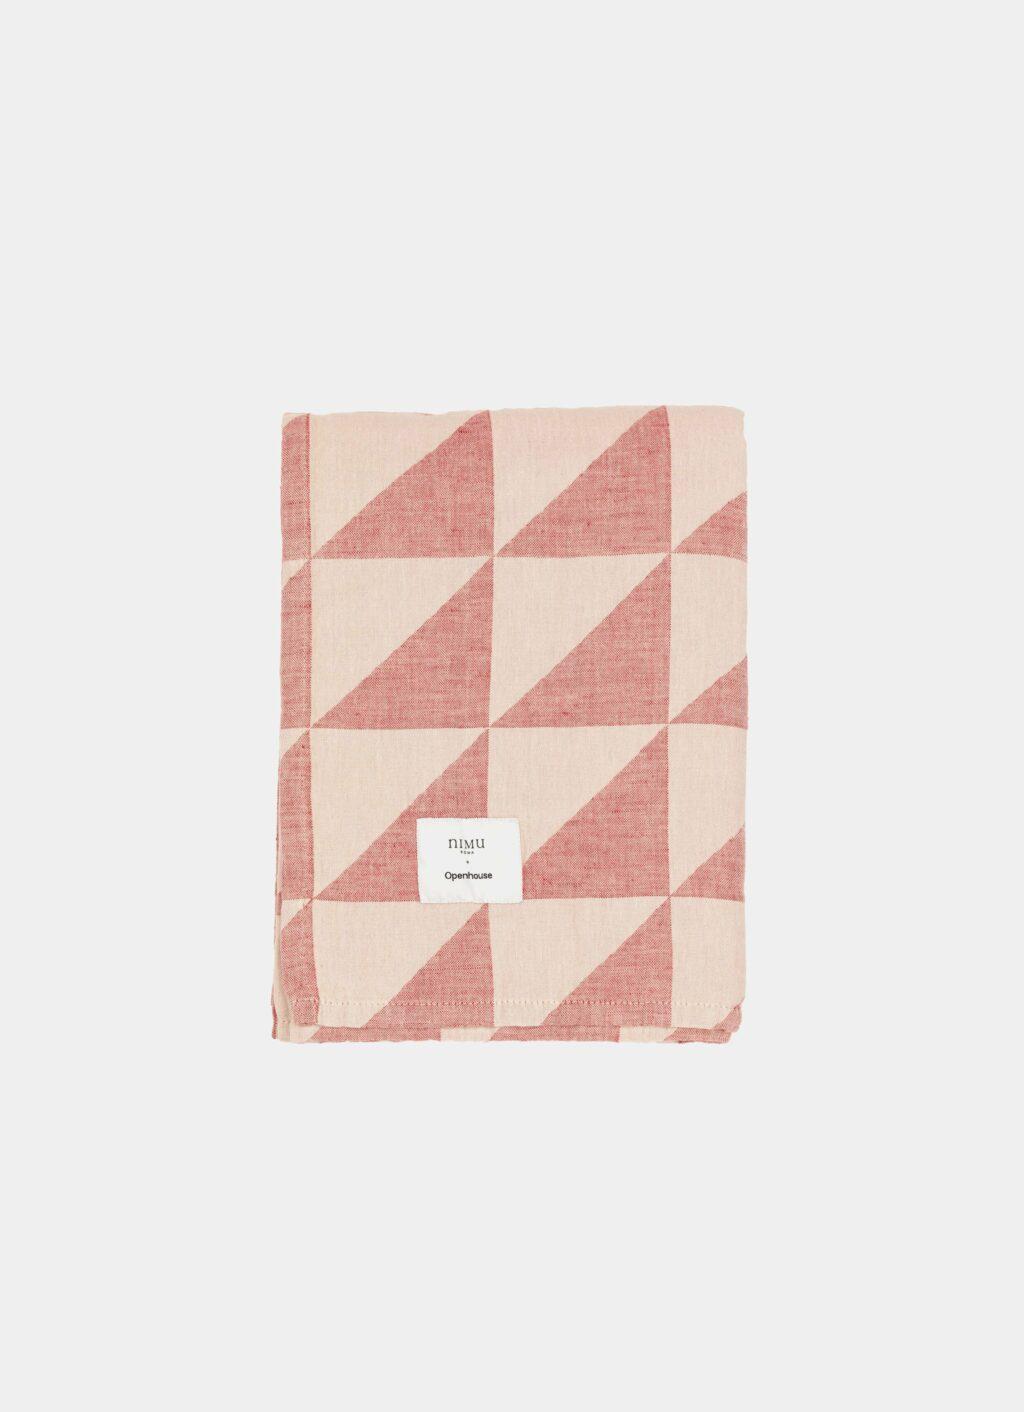 Nimu Roma - Openhouse - Limited Edition - Puglia Beach Towel - 170x135cm